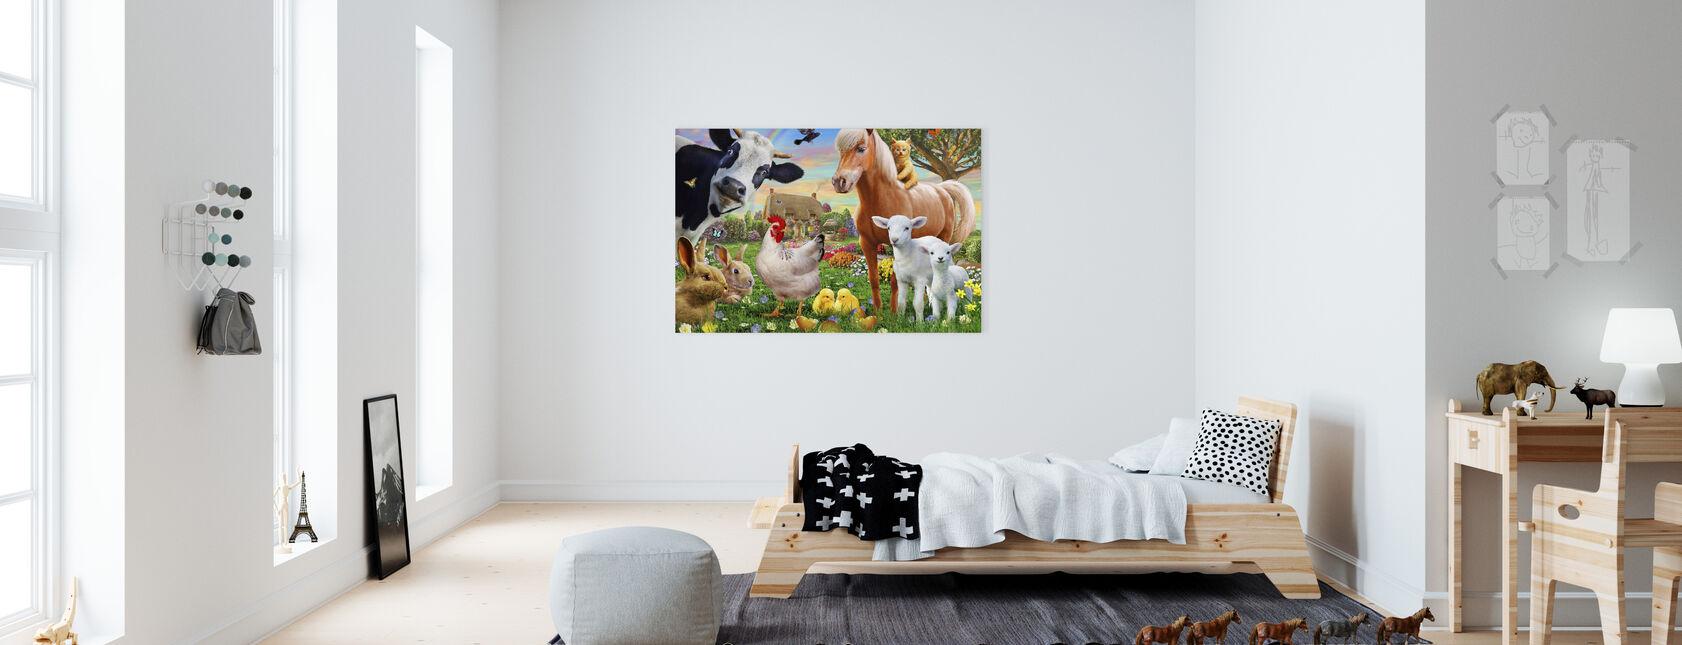 Farm Animals for kids - Canvas print - Kids Room